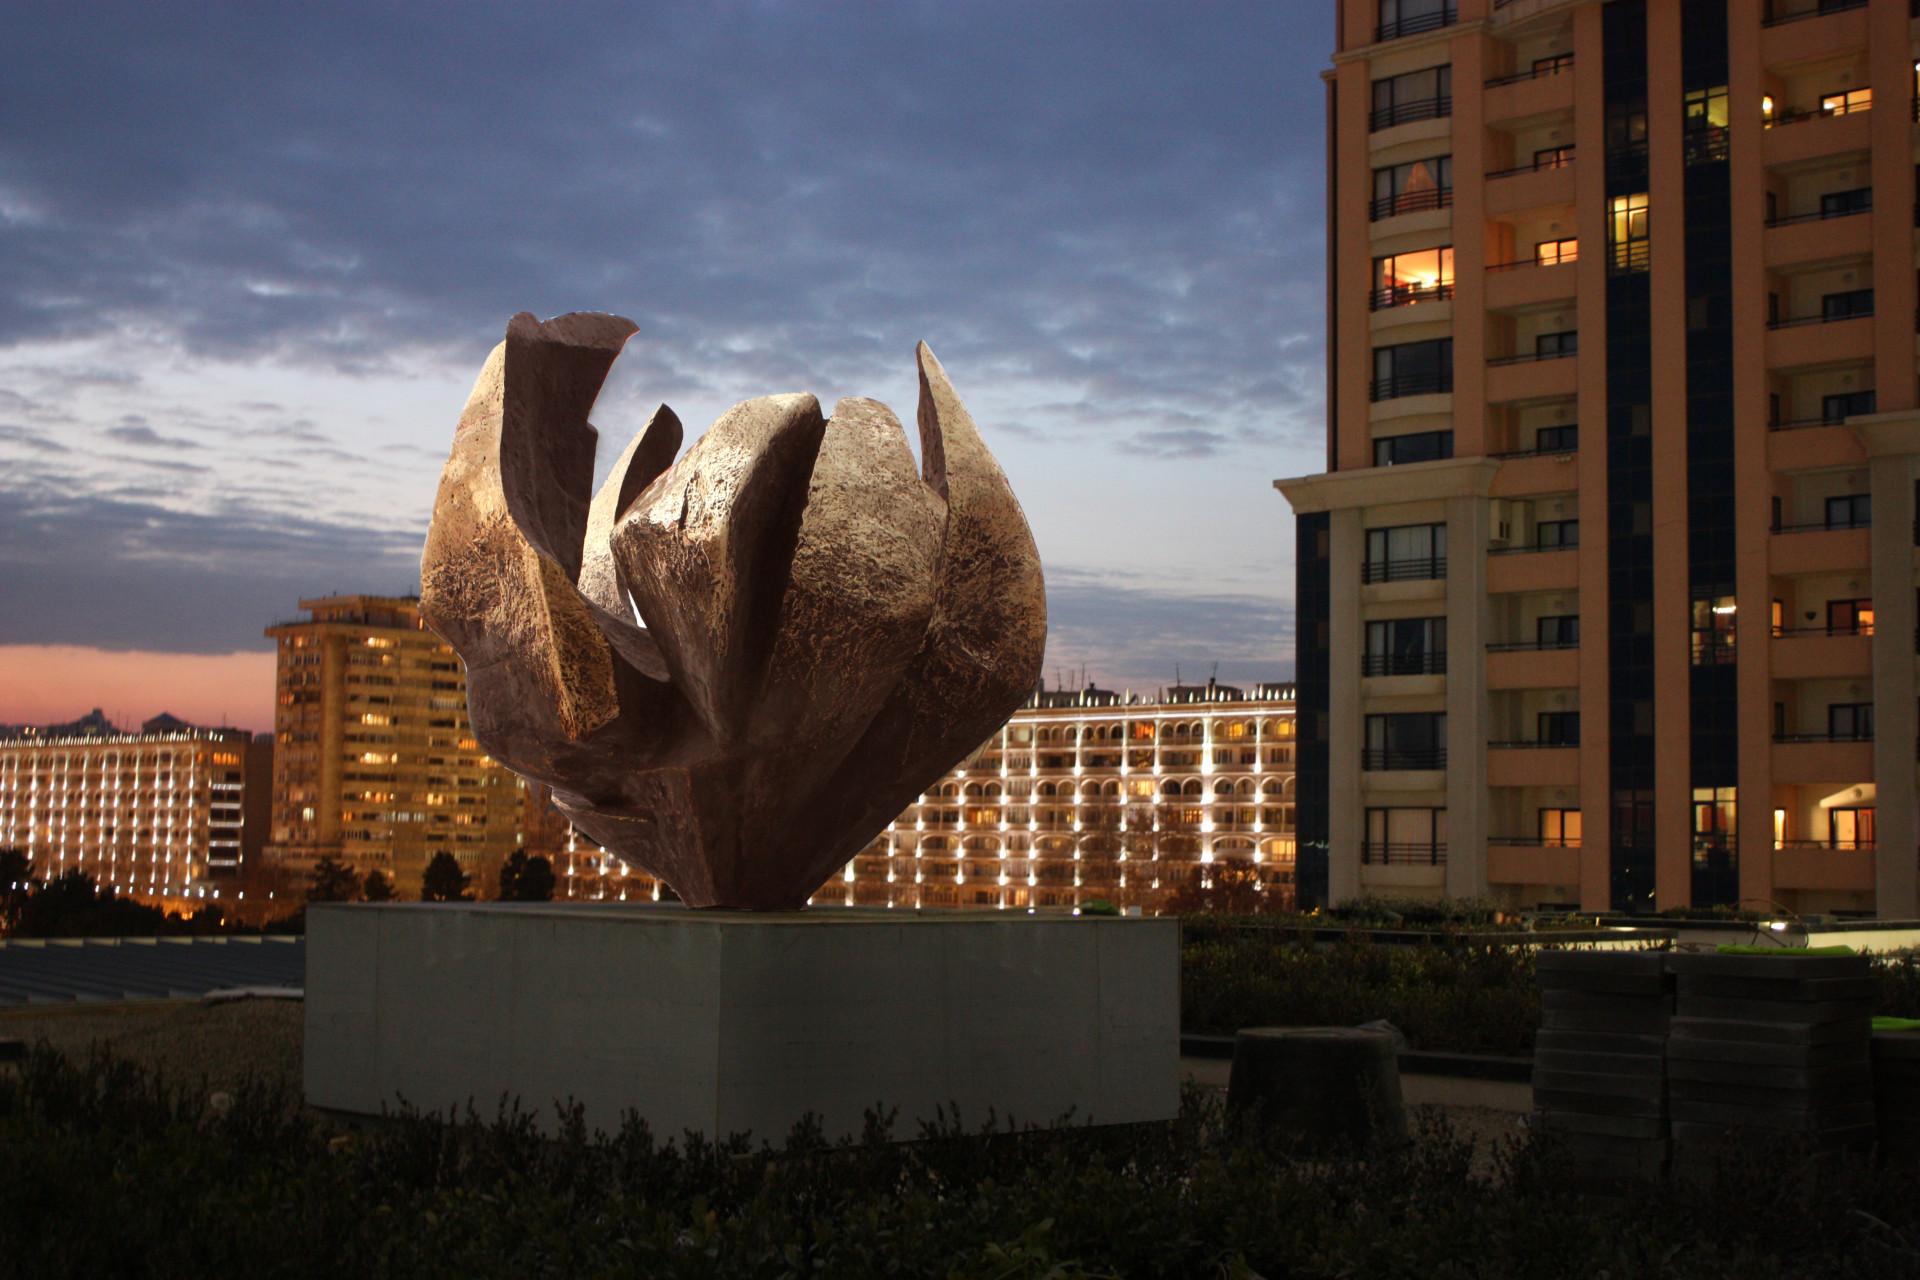 JW MARRIOTT HOTEL « Absheron Lights» 350 x 450 x 400 bronze jpg